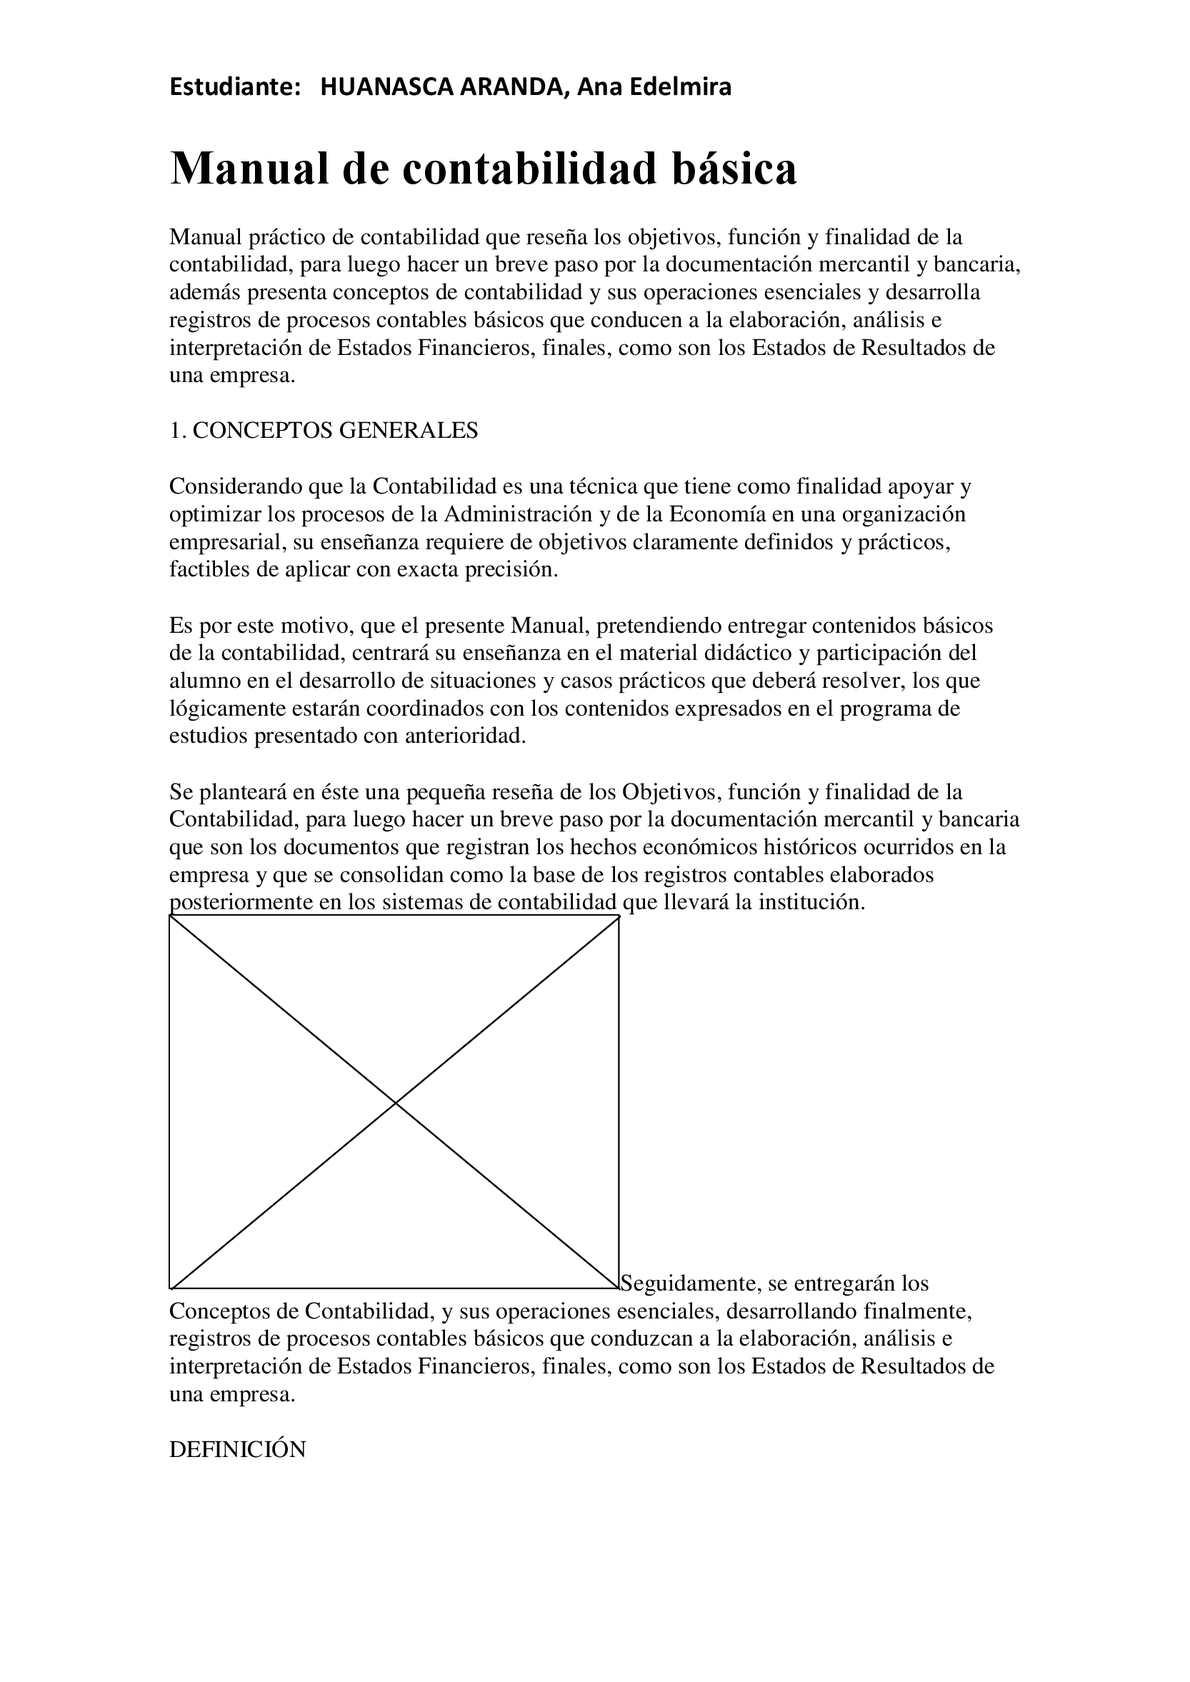 Calaméo - MANUAL DE CONTABILIDAD BASICA